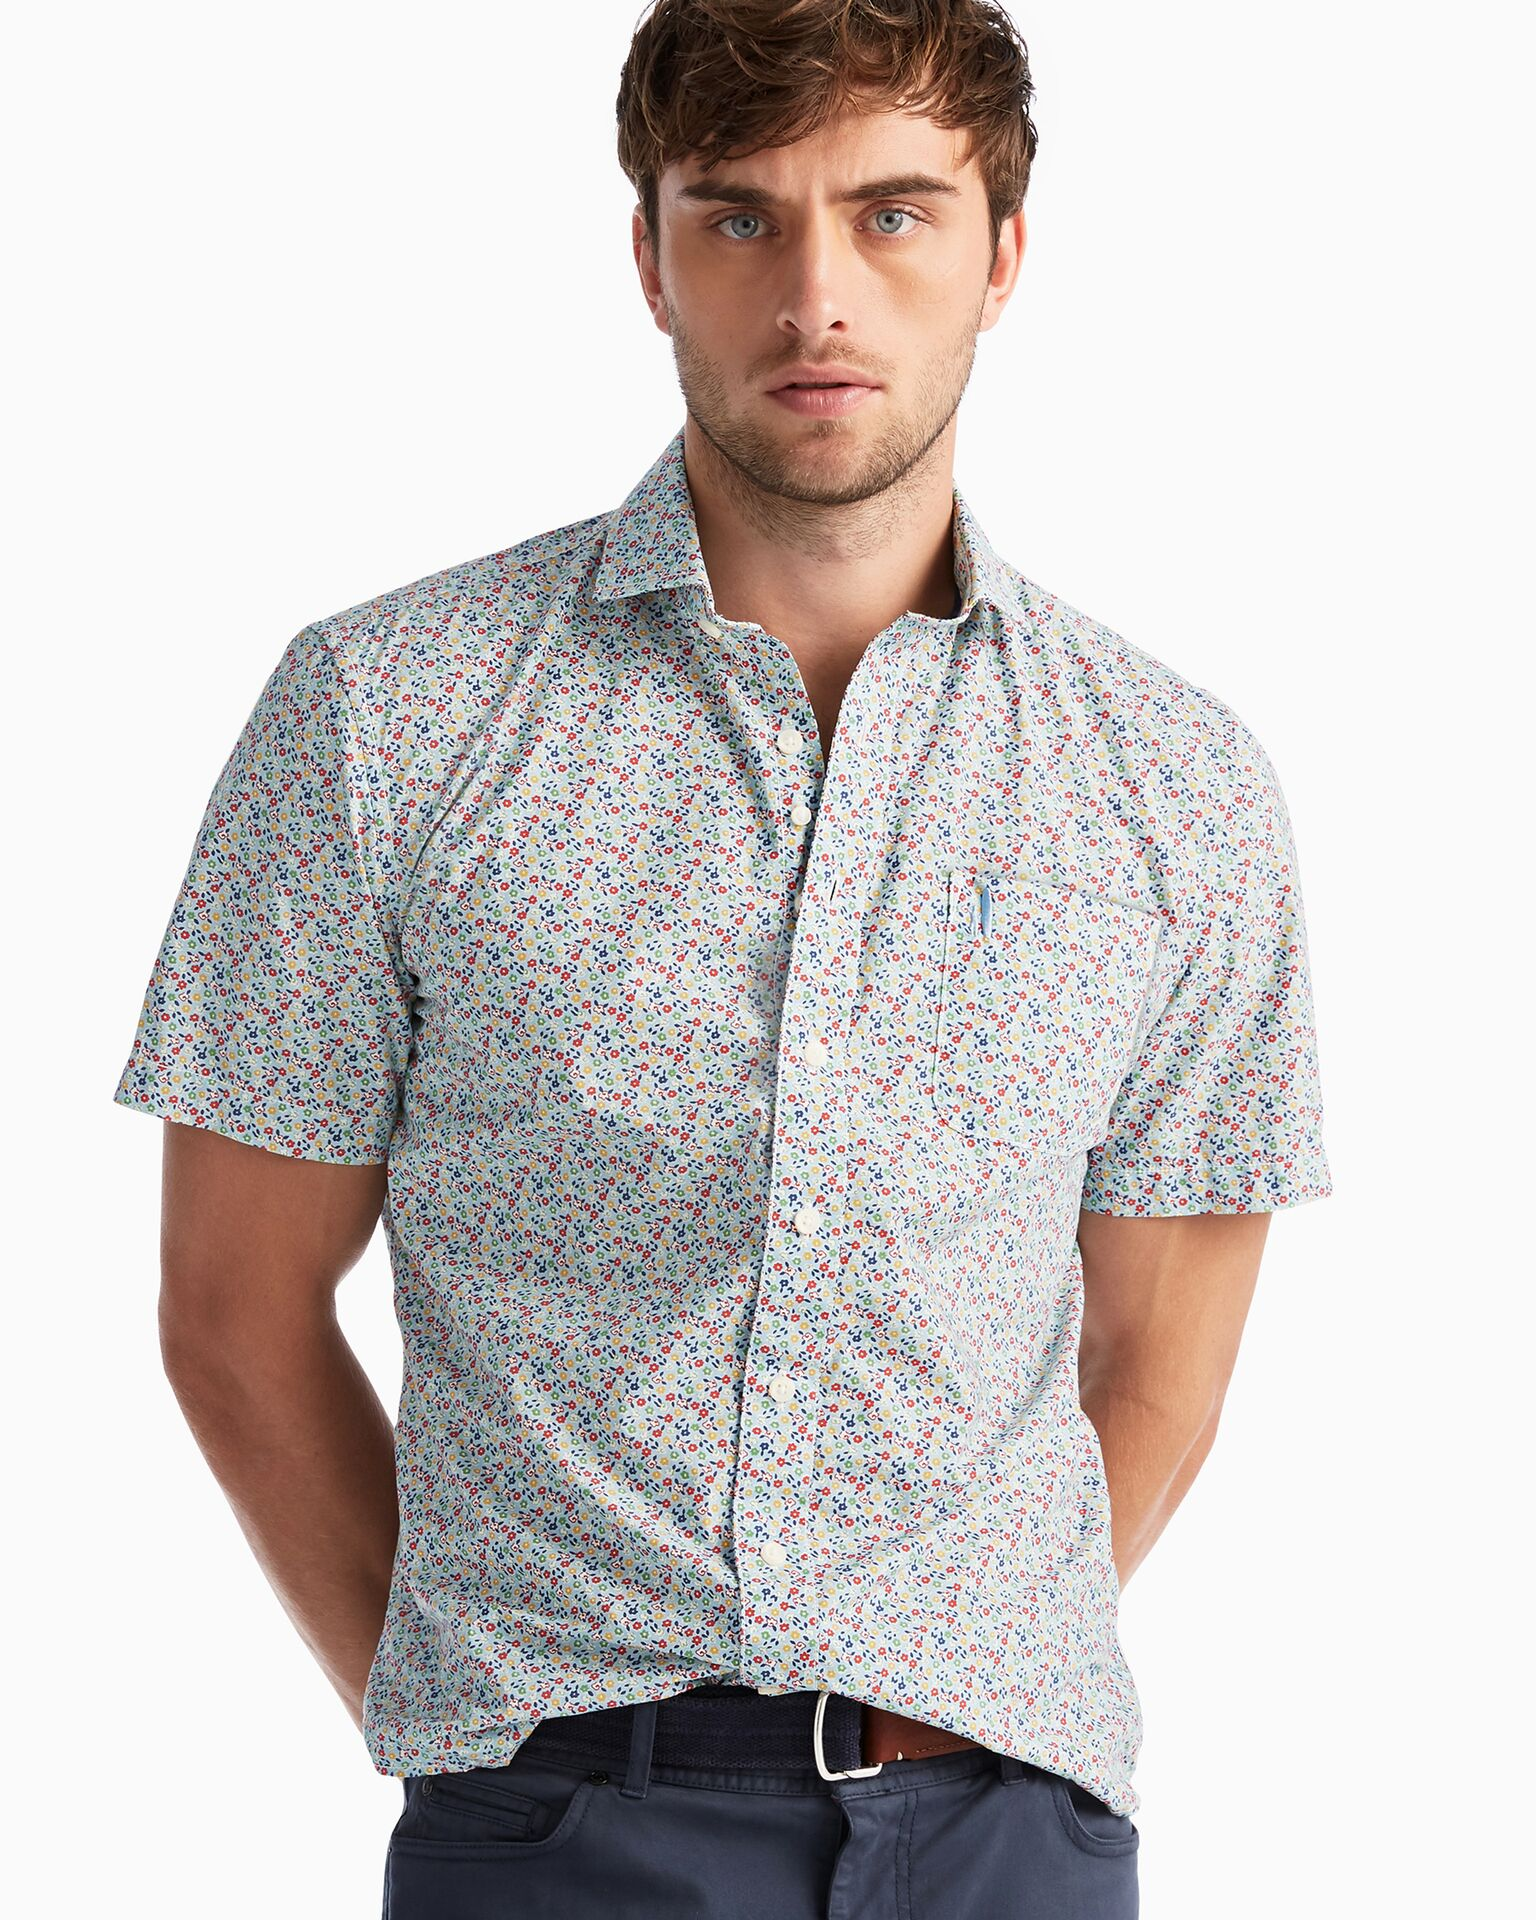 Vincent Hangin' Out Button Down Short Sleeve Shirt (Gulf Blue)